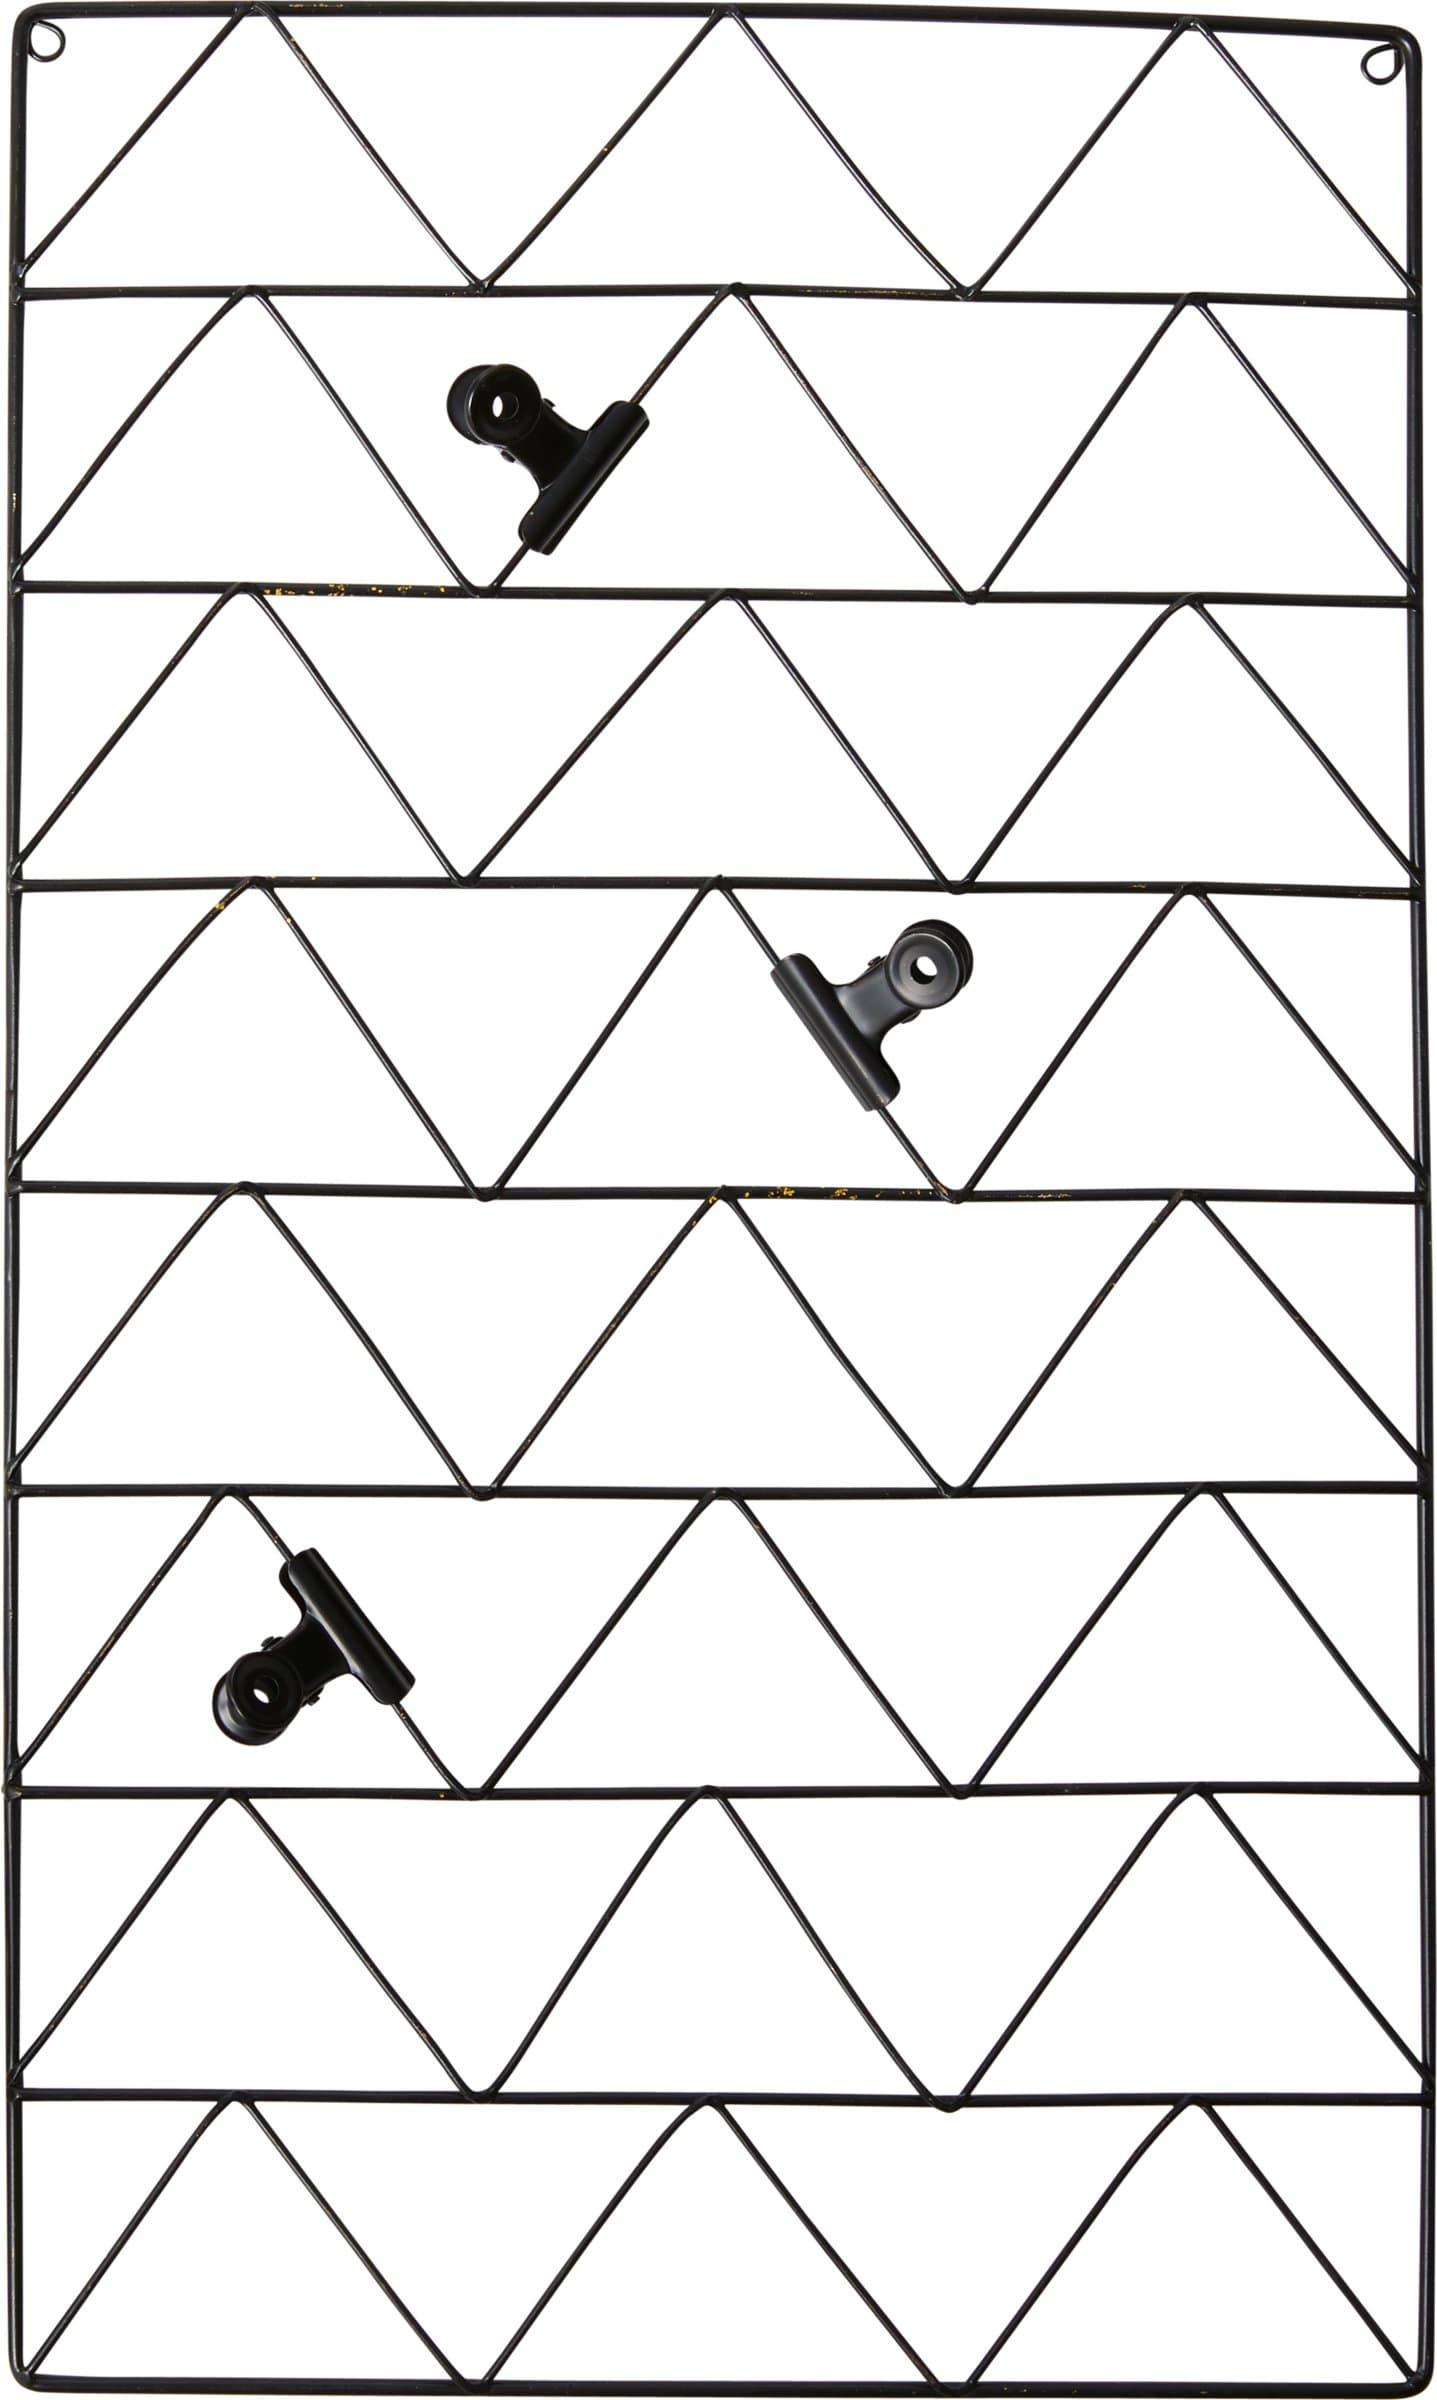 LANE Griglia per pareti